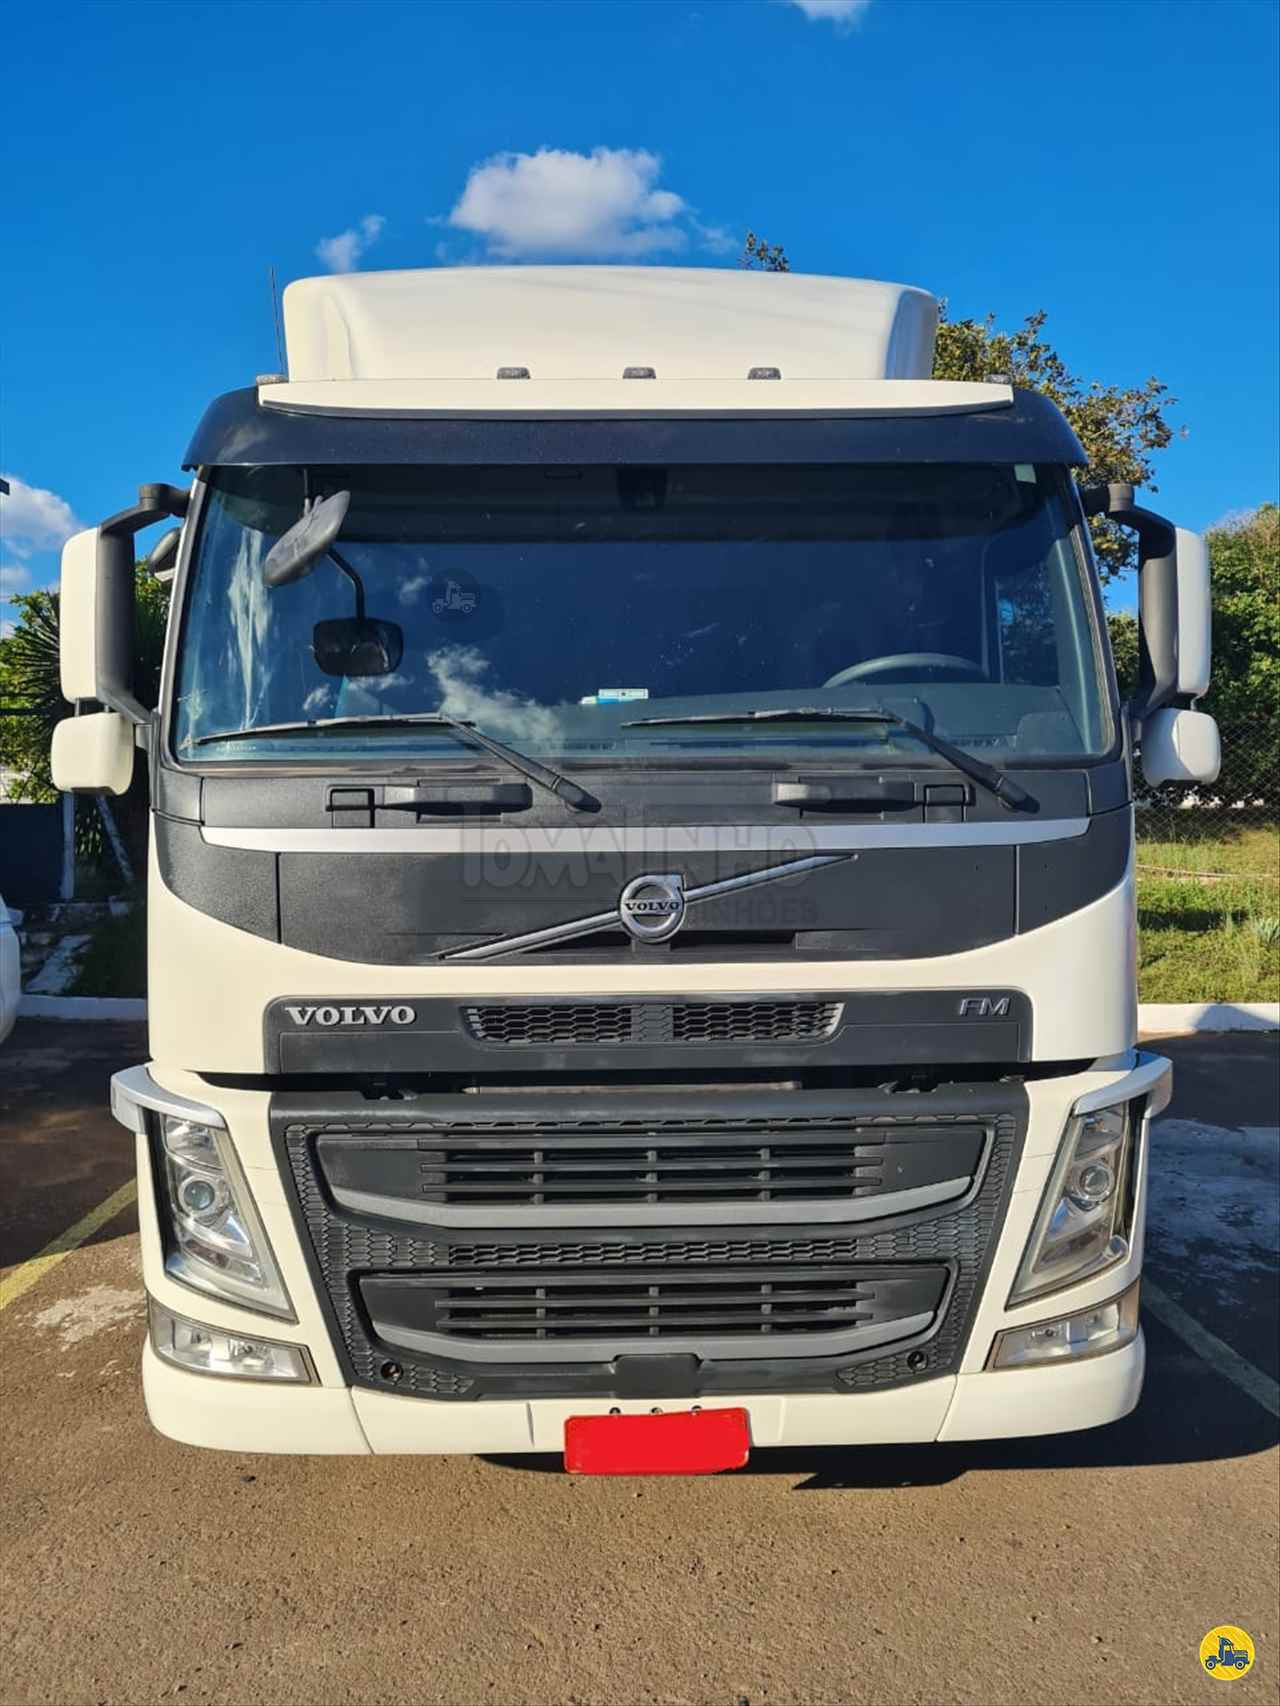 CAMINHAO VOLVO VOLVO FM 380 Cavalo Mecânico Truck 6x2 Tomatinho Caminhões RIBEIRAO PRETO SÃO PAULO SP